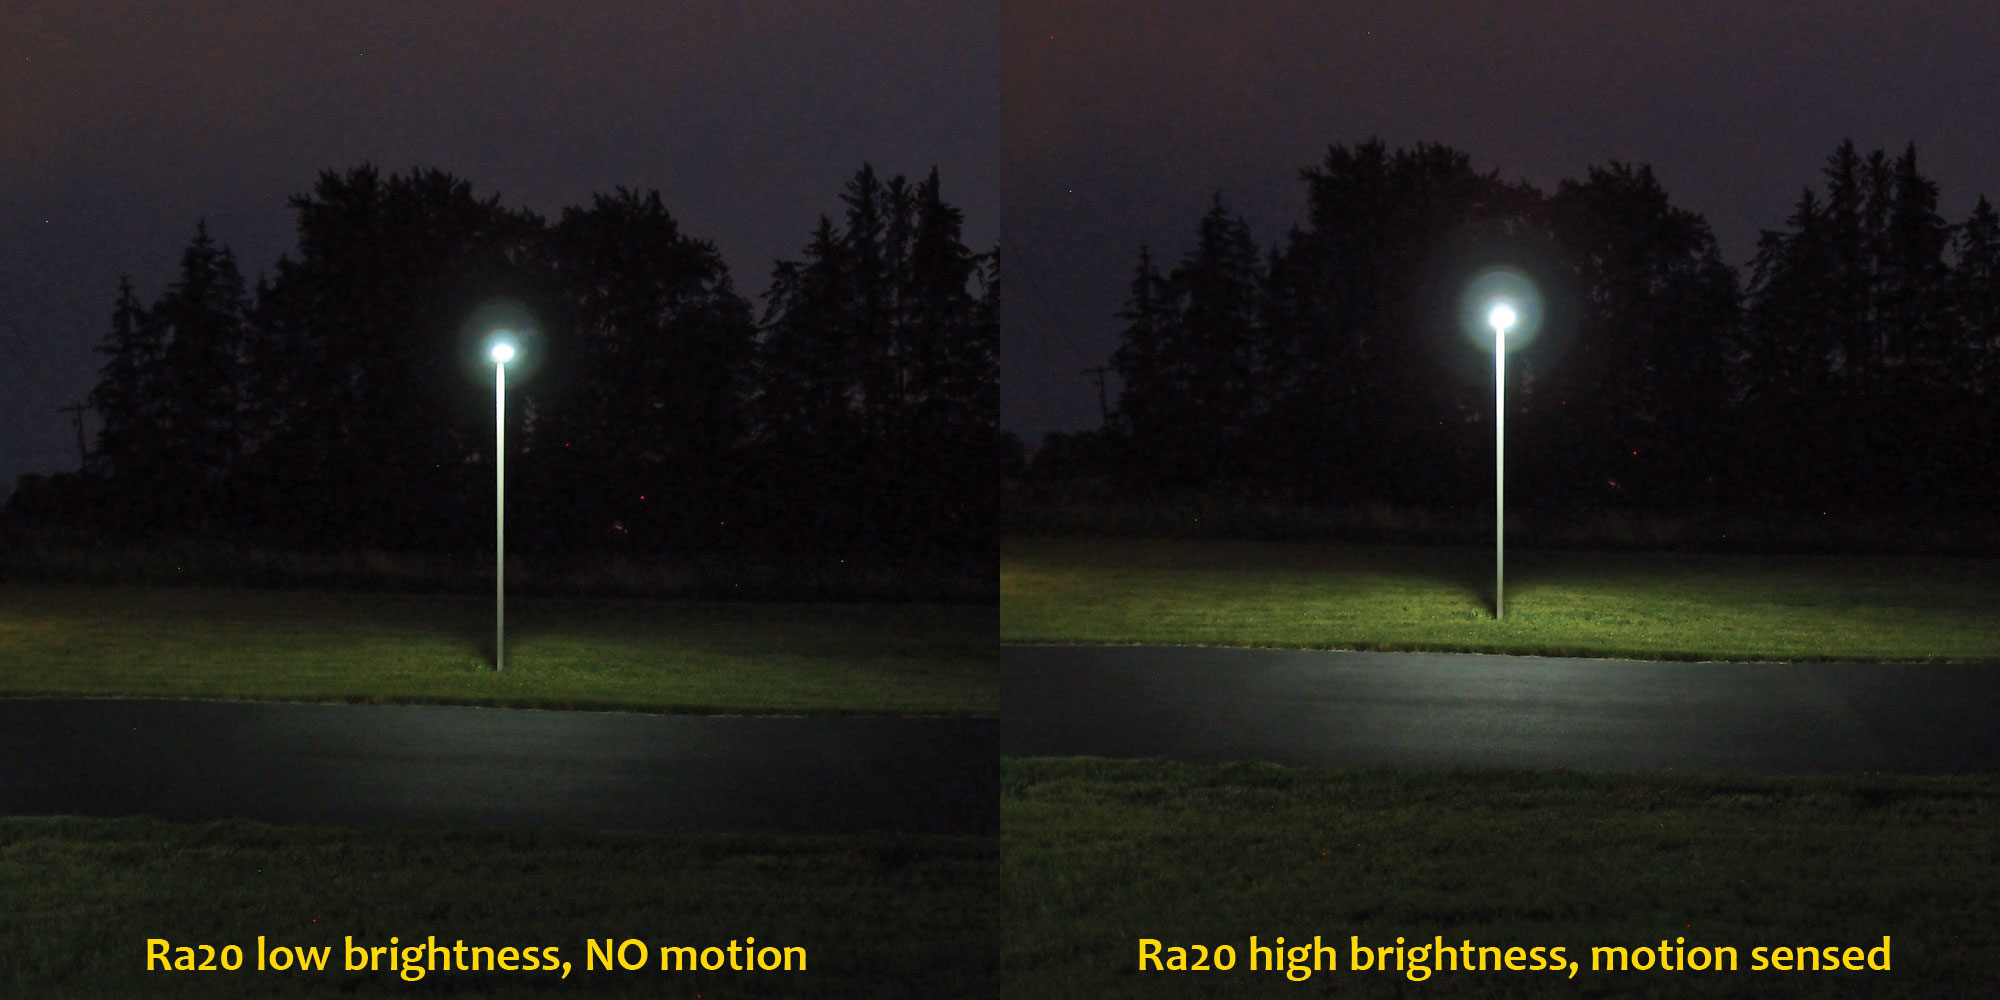 Solar Light For Driveways Parking Lots Walking Trails Ra20